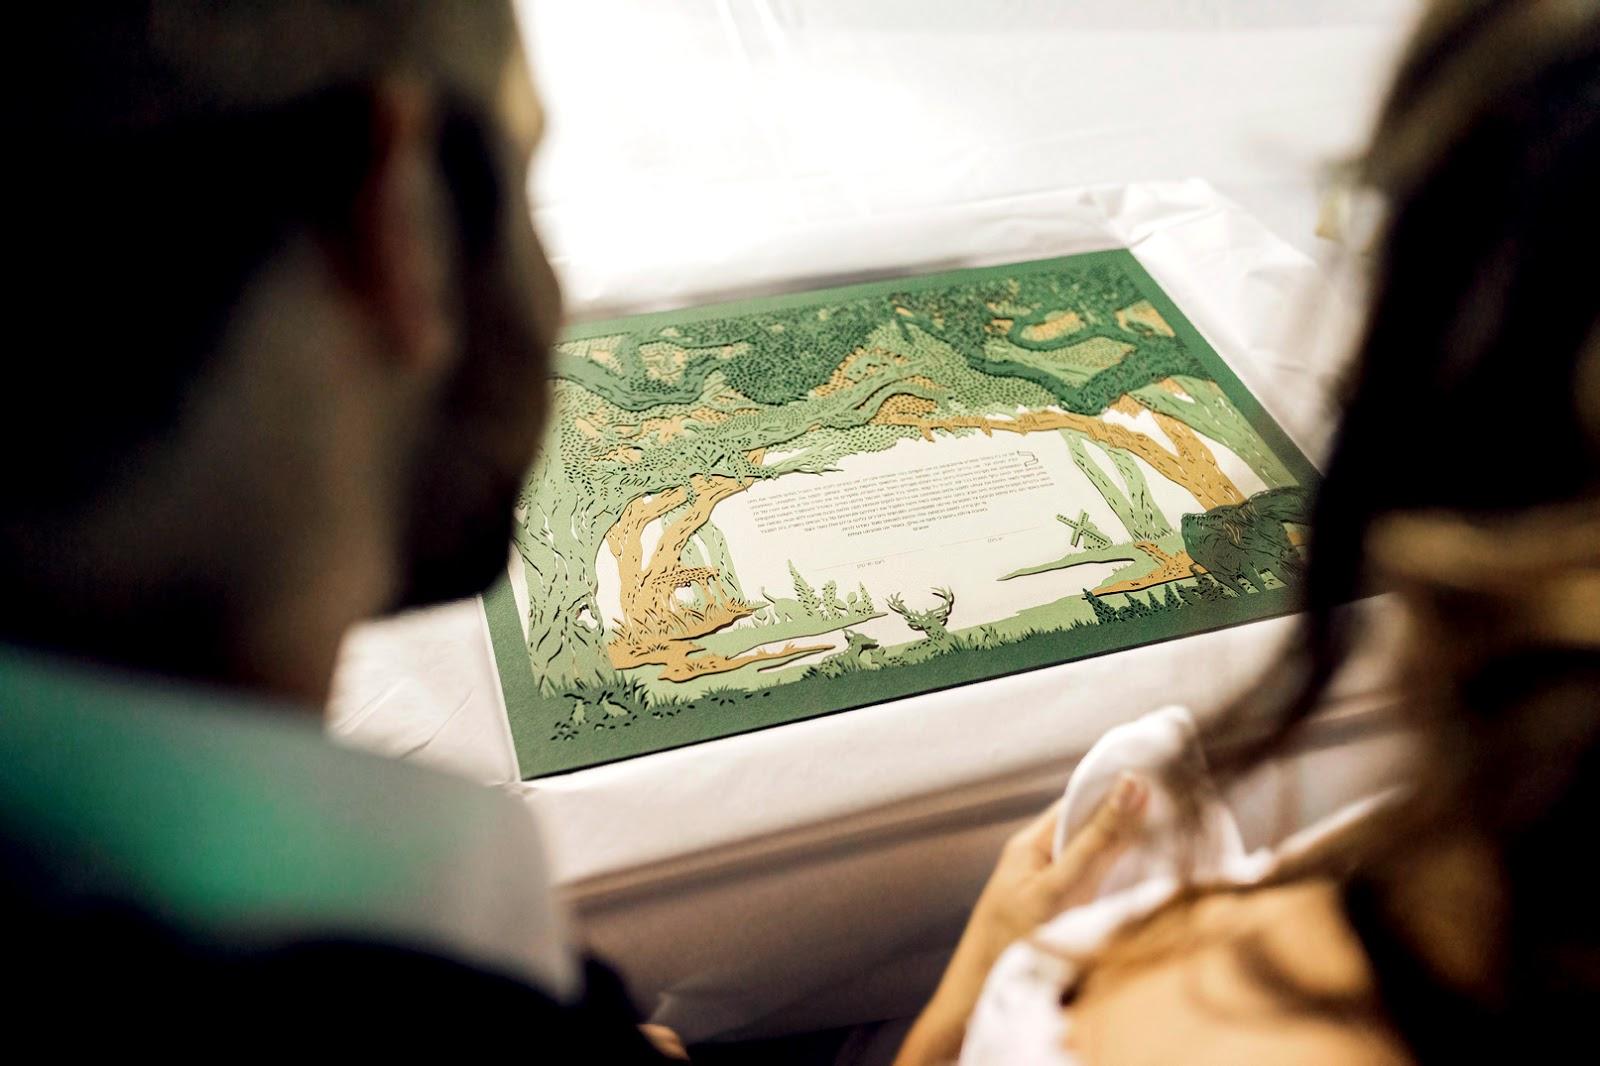 You & Me Always papercut ketubah by Woodland Papercuts, photo by Adrian Sebal